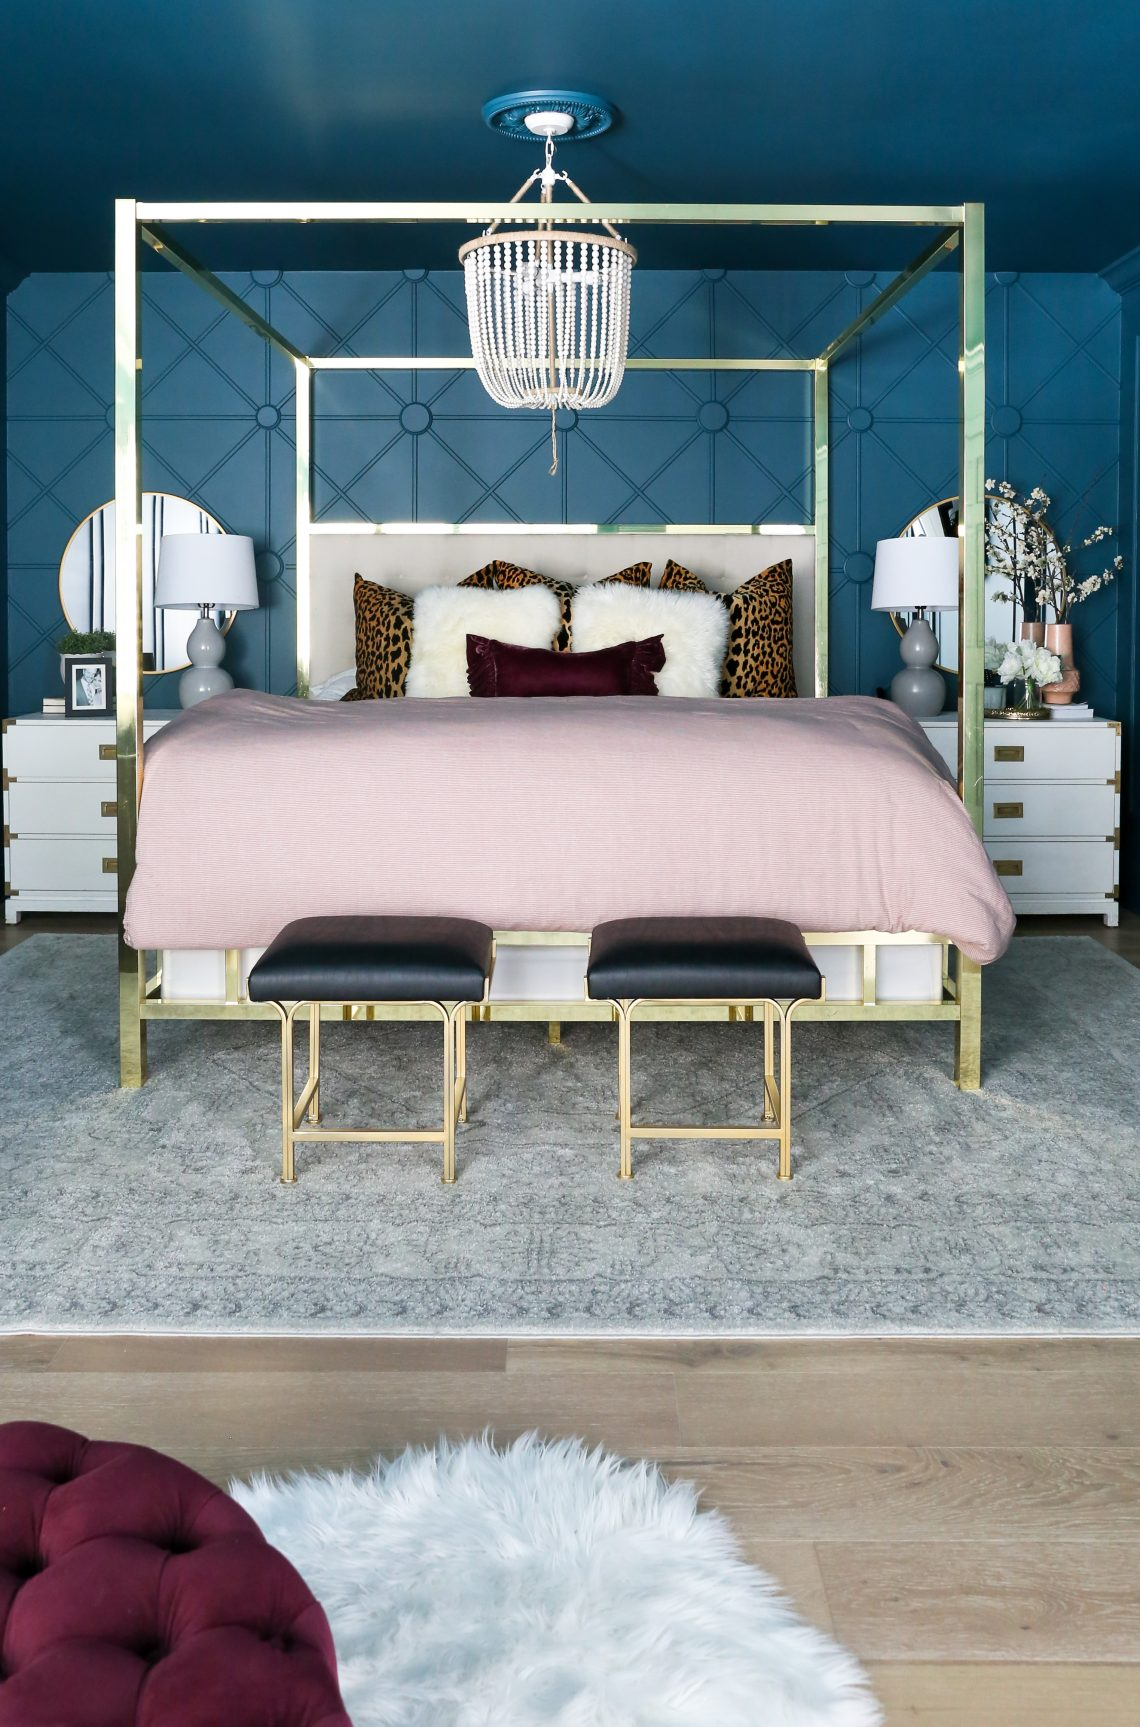 Savannah's Modern Ranch House: Master Bedroom Reveal